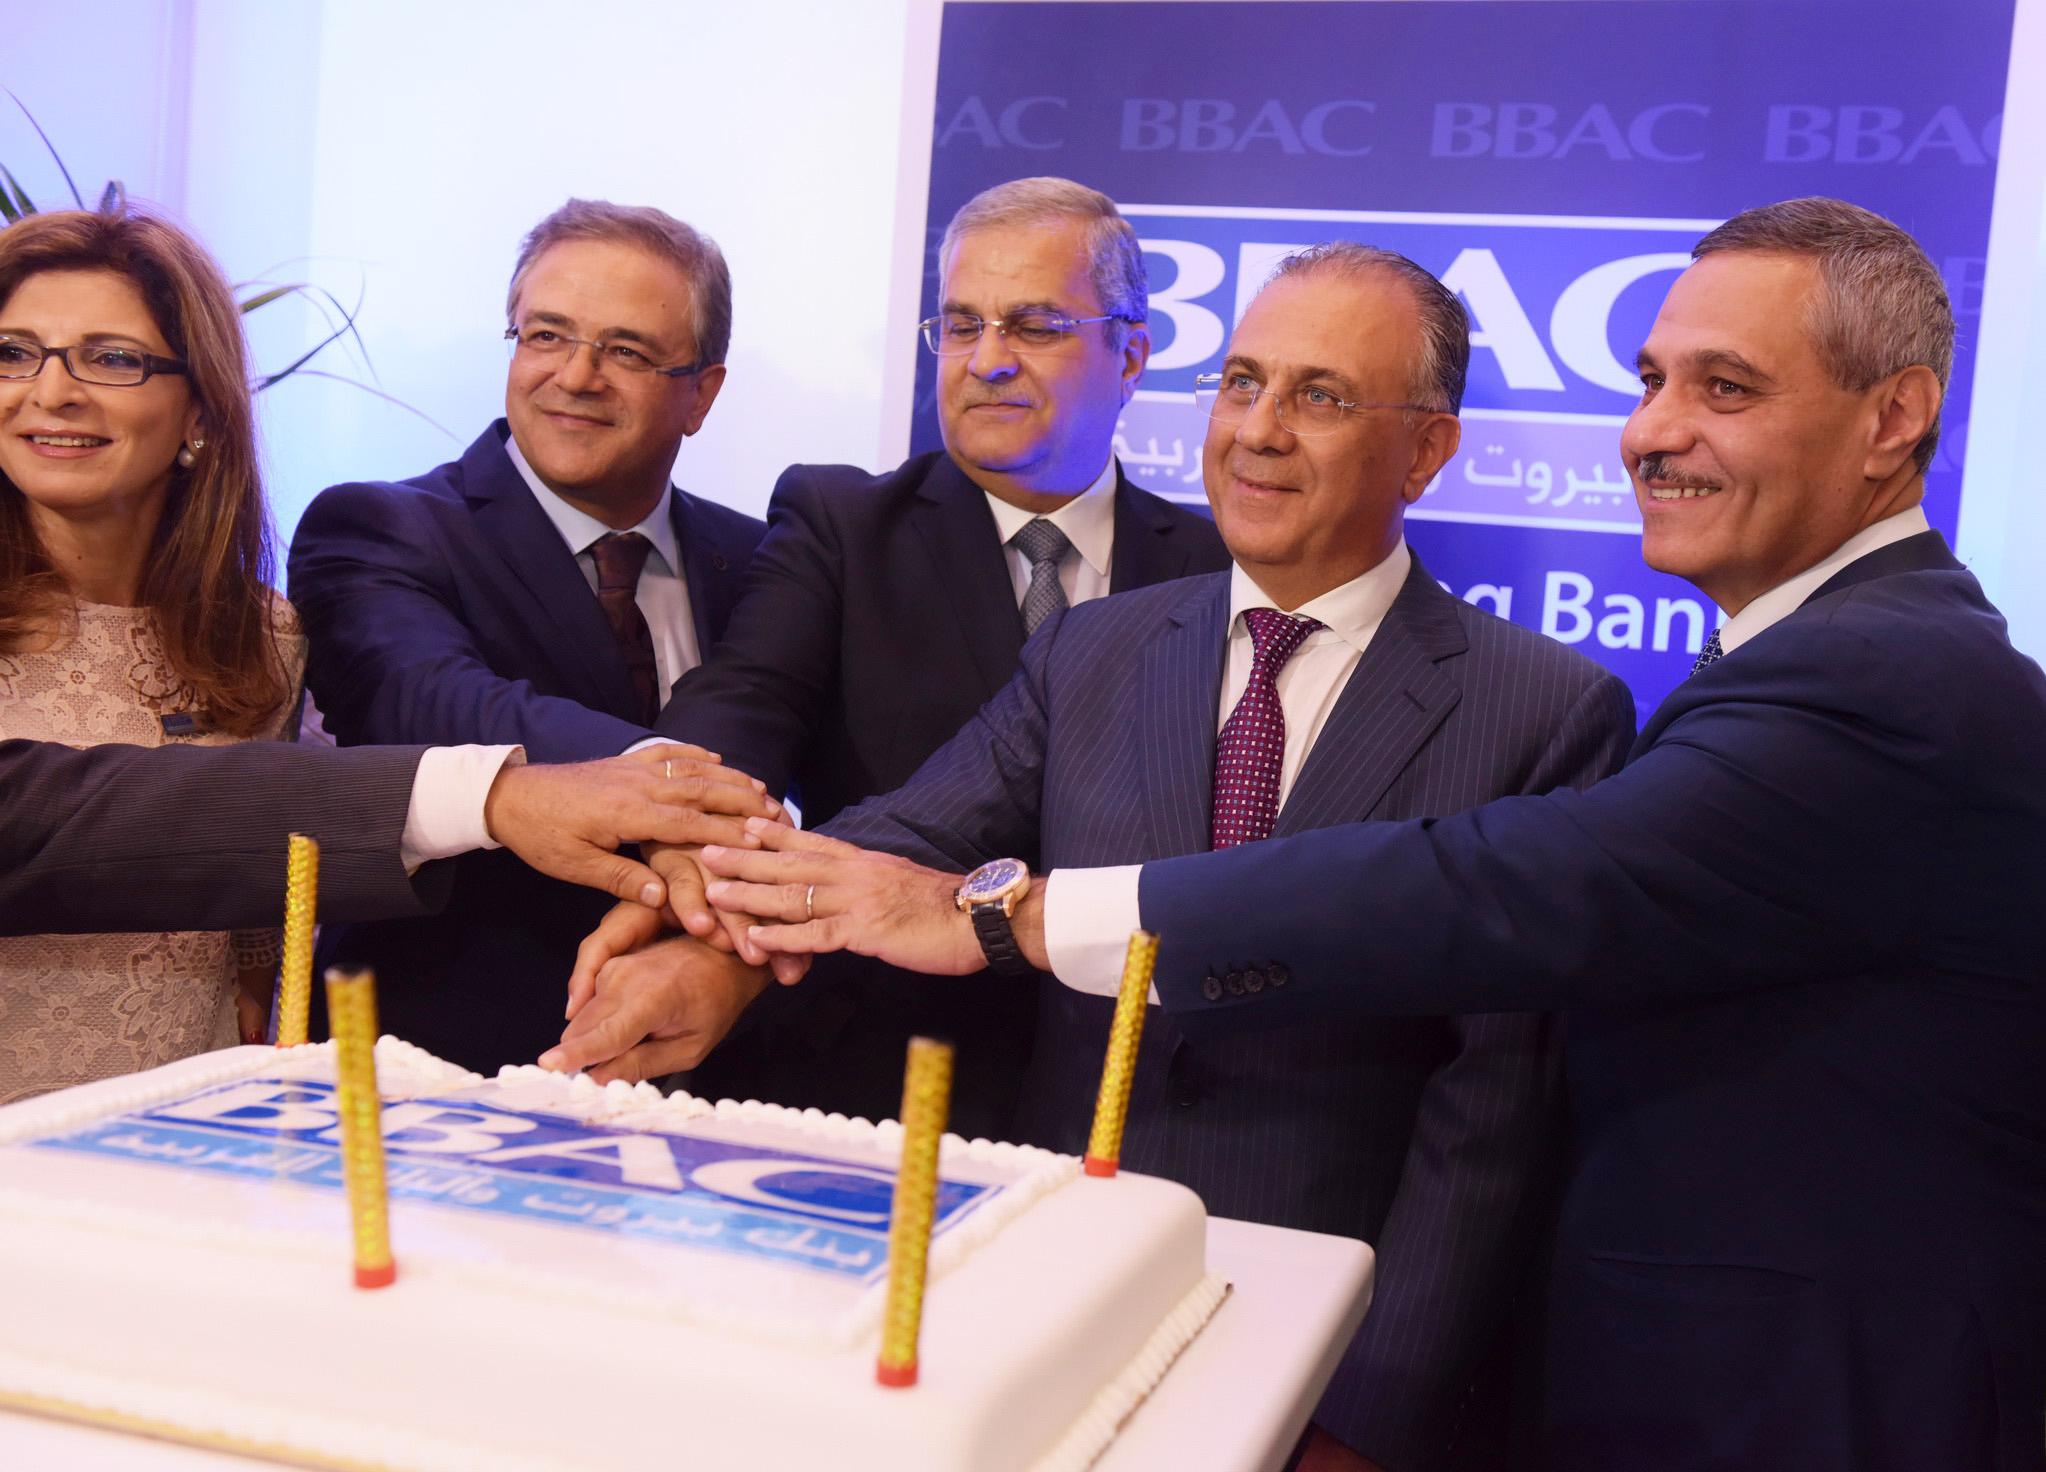 BBAC Hazmieh Branch Opening - Oct. 2015